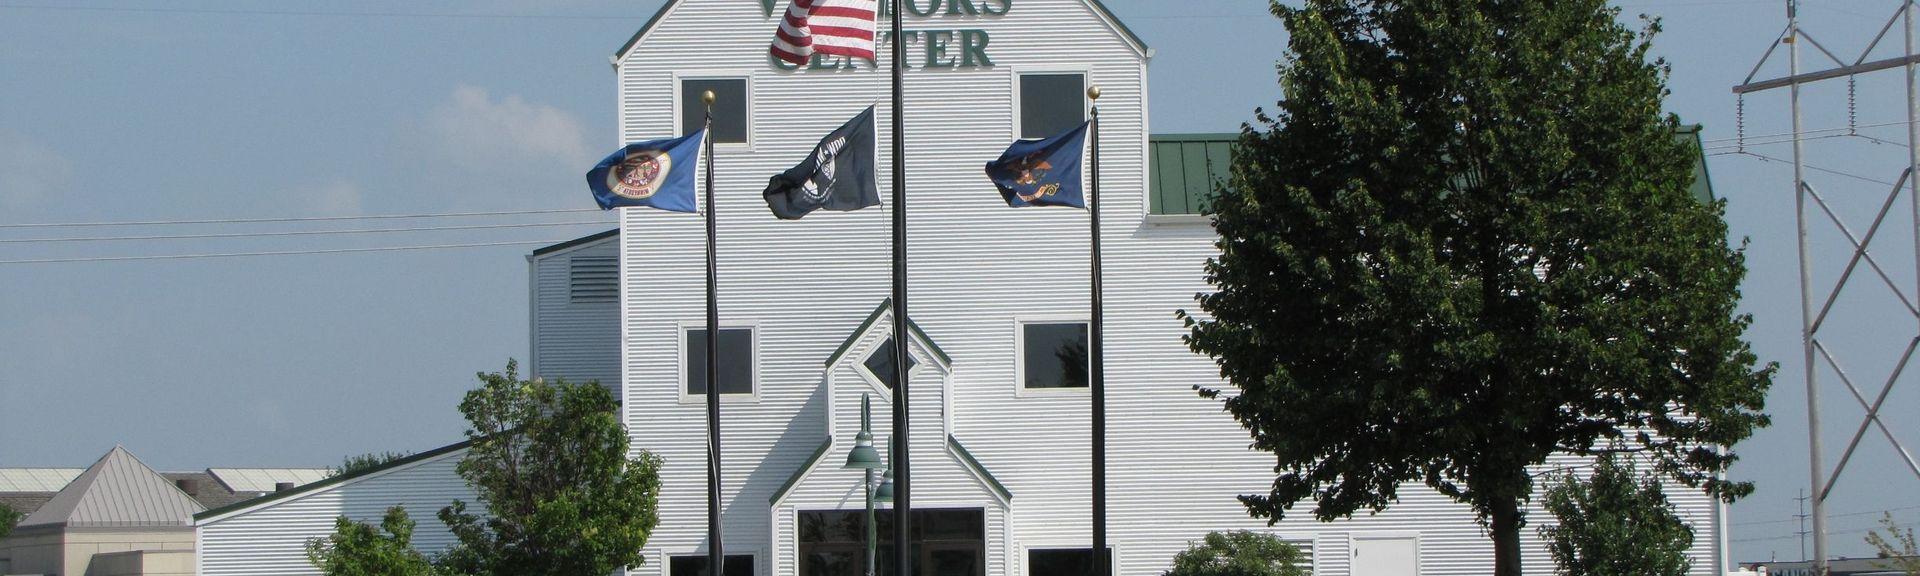 Fargo, North Dakota, USA